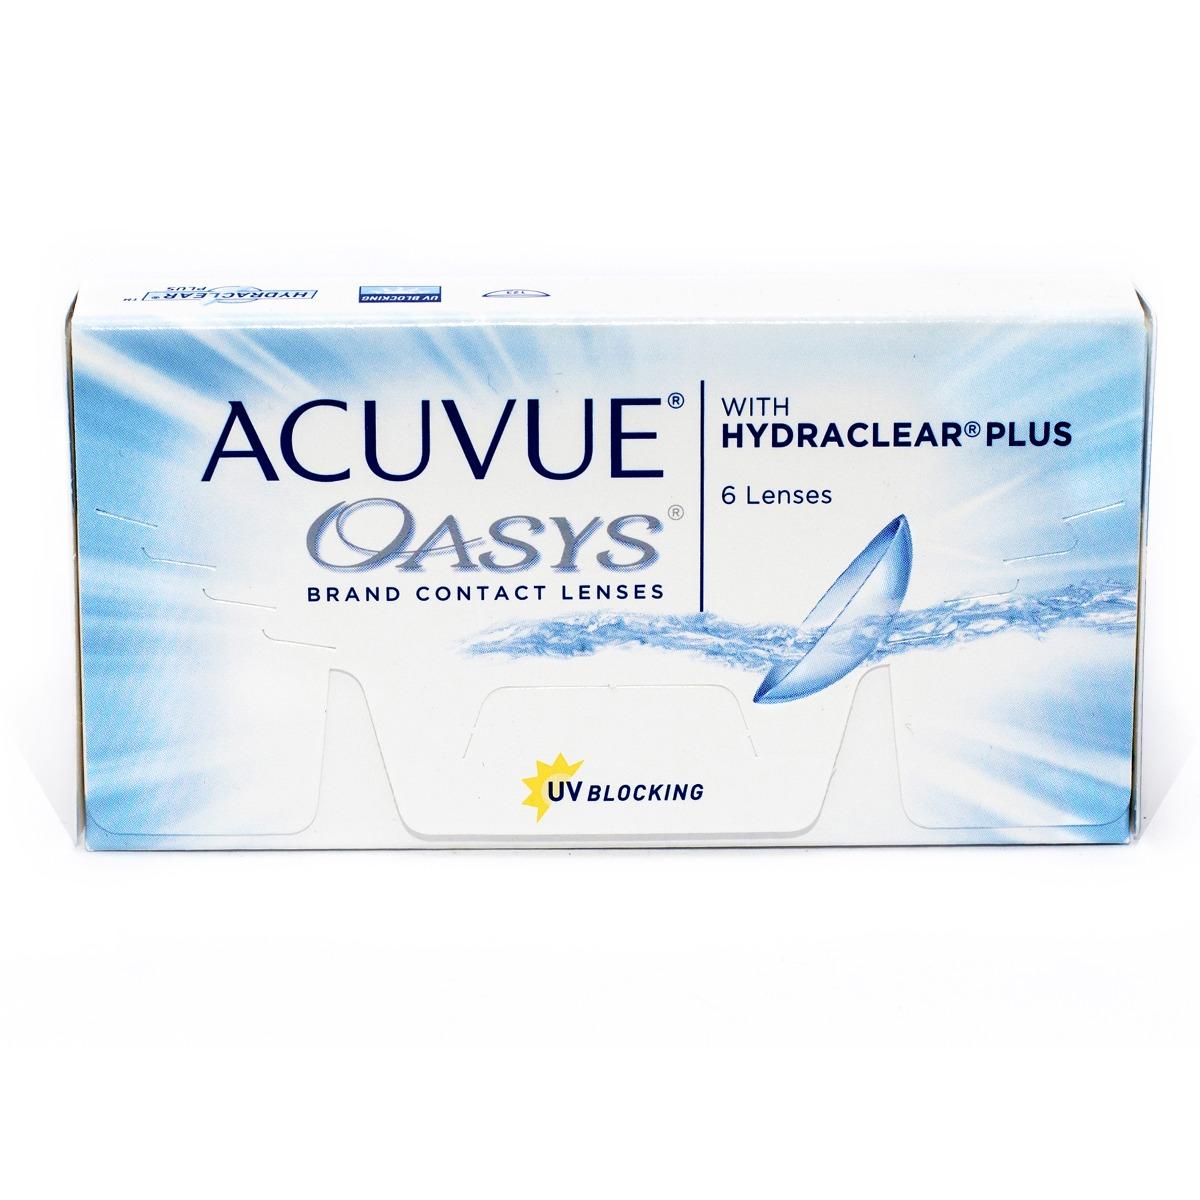 Lentes De Contato Acuvue Oasys Com Hydraclear Plus Grau-4.00 - R ... 5bcf0990be